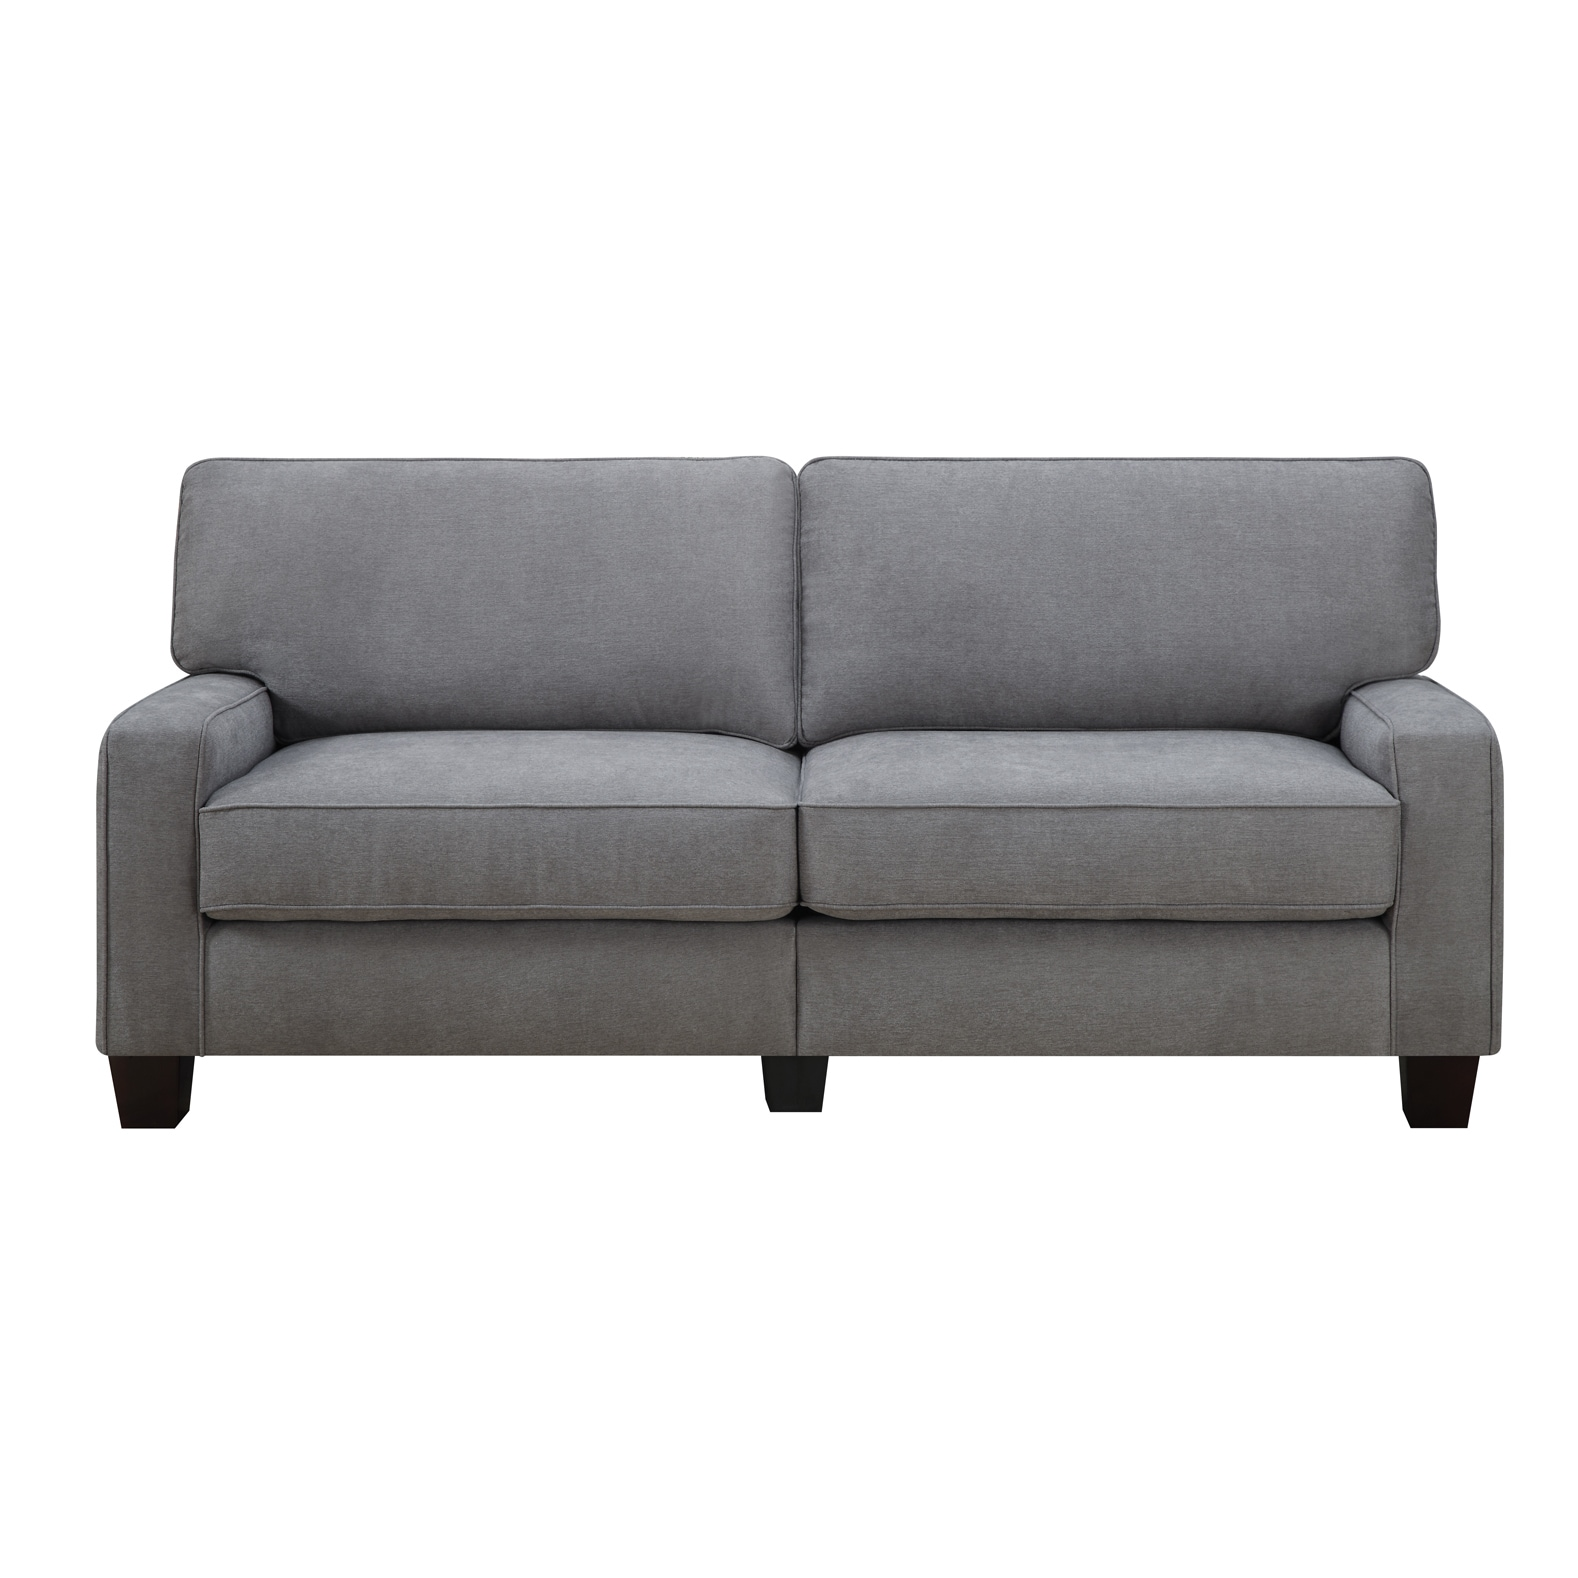 serta rta martinique collection 78 inch kona grey fabric sofa